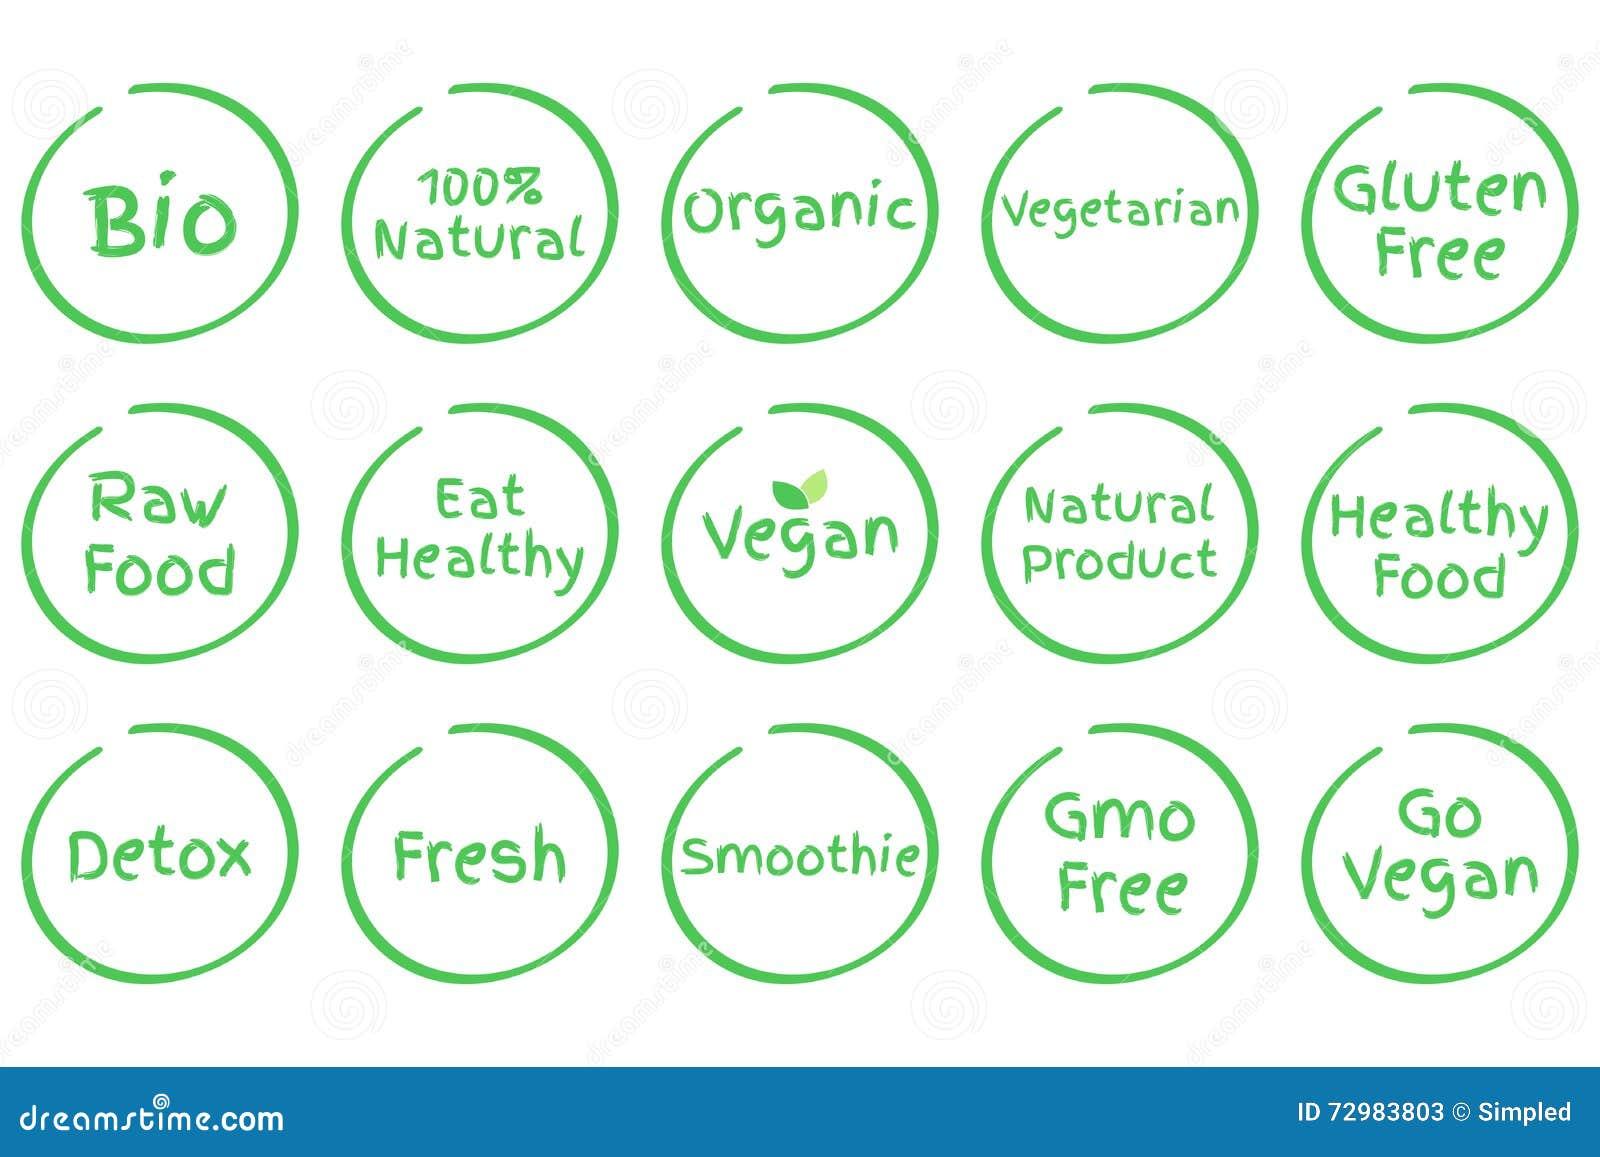 Public Domain Healthy Food Symbols